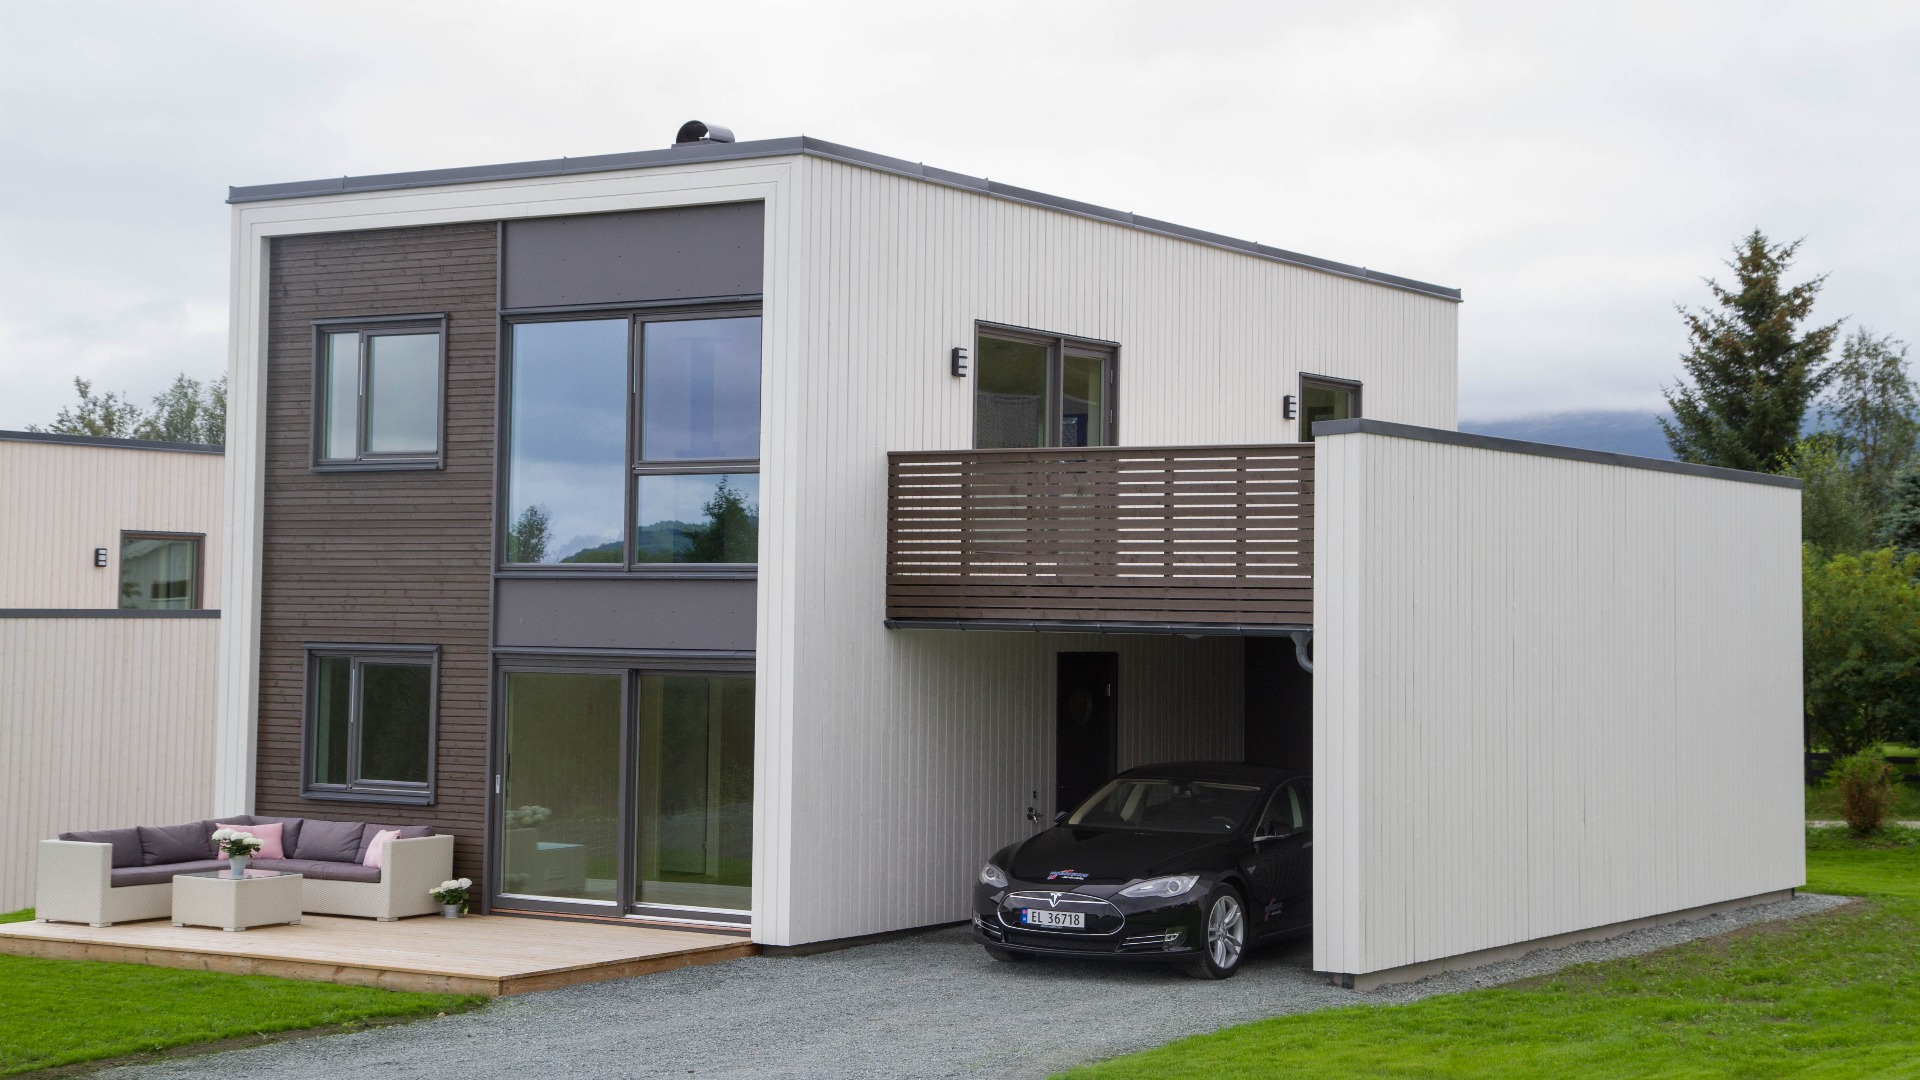 En ryddig og stilfull fasade